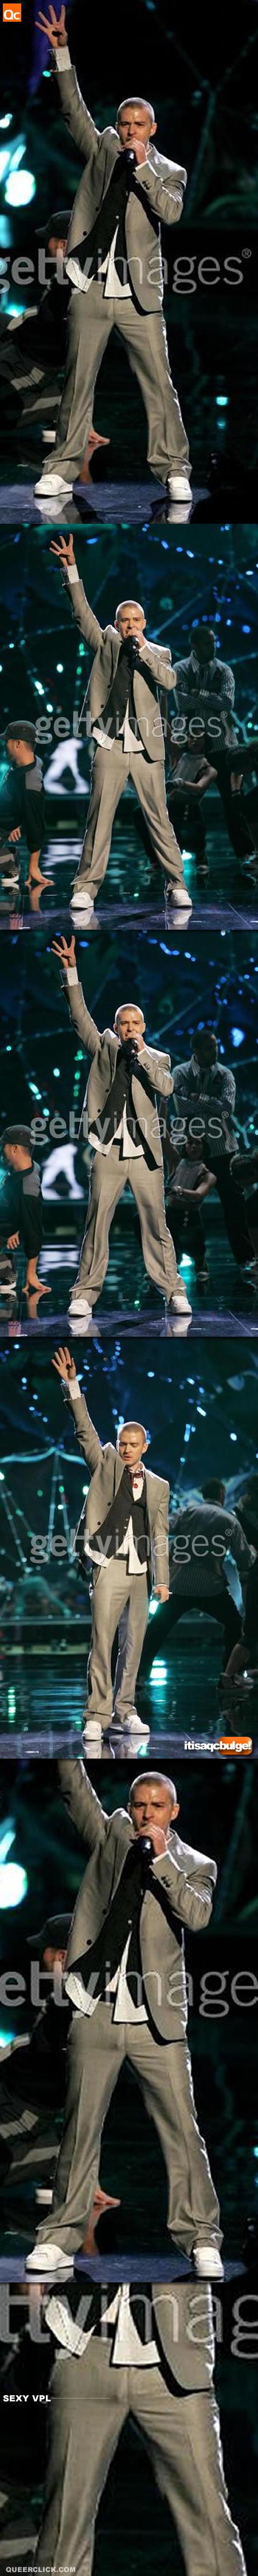 Justin Timberlake's Sexy VPL/Bulge